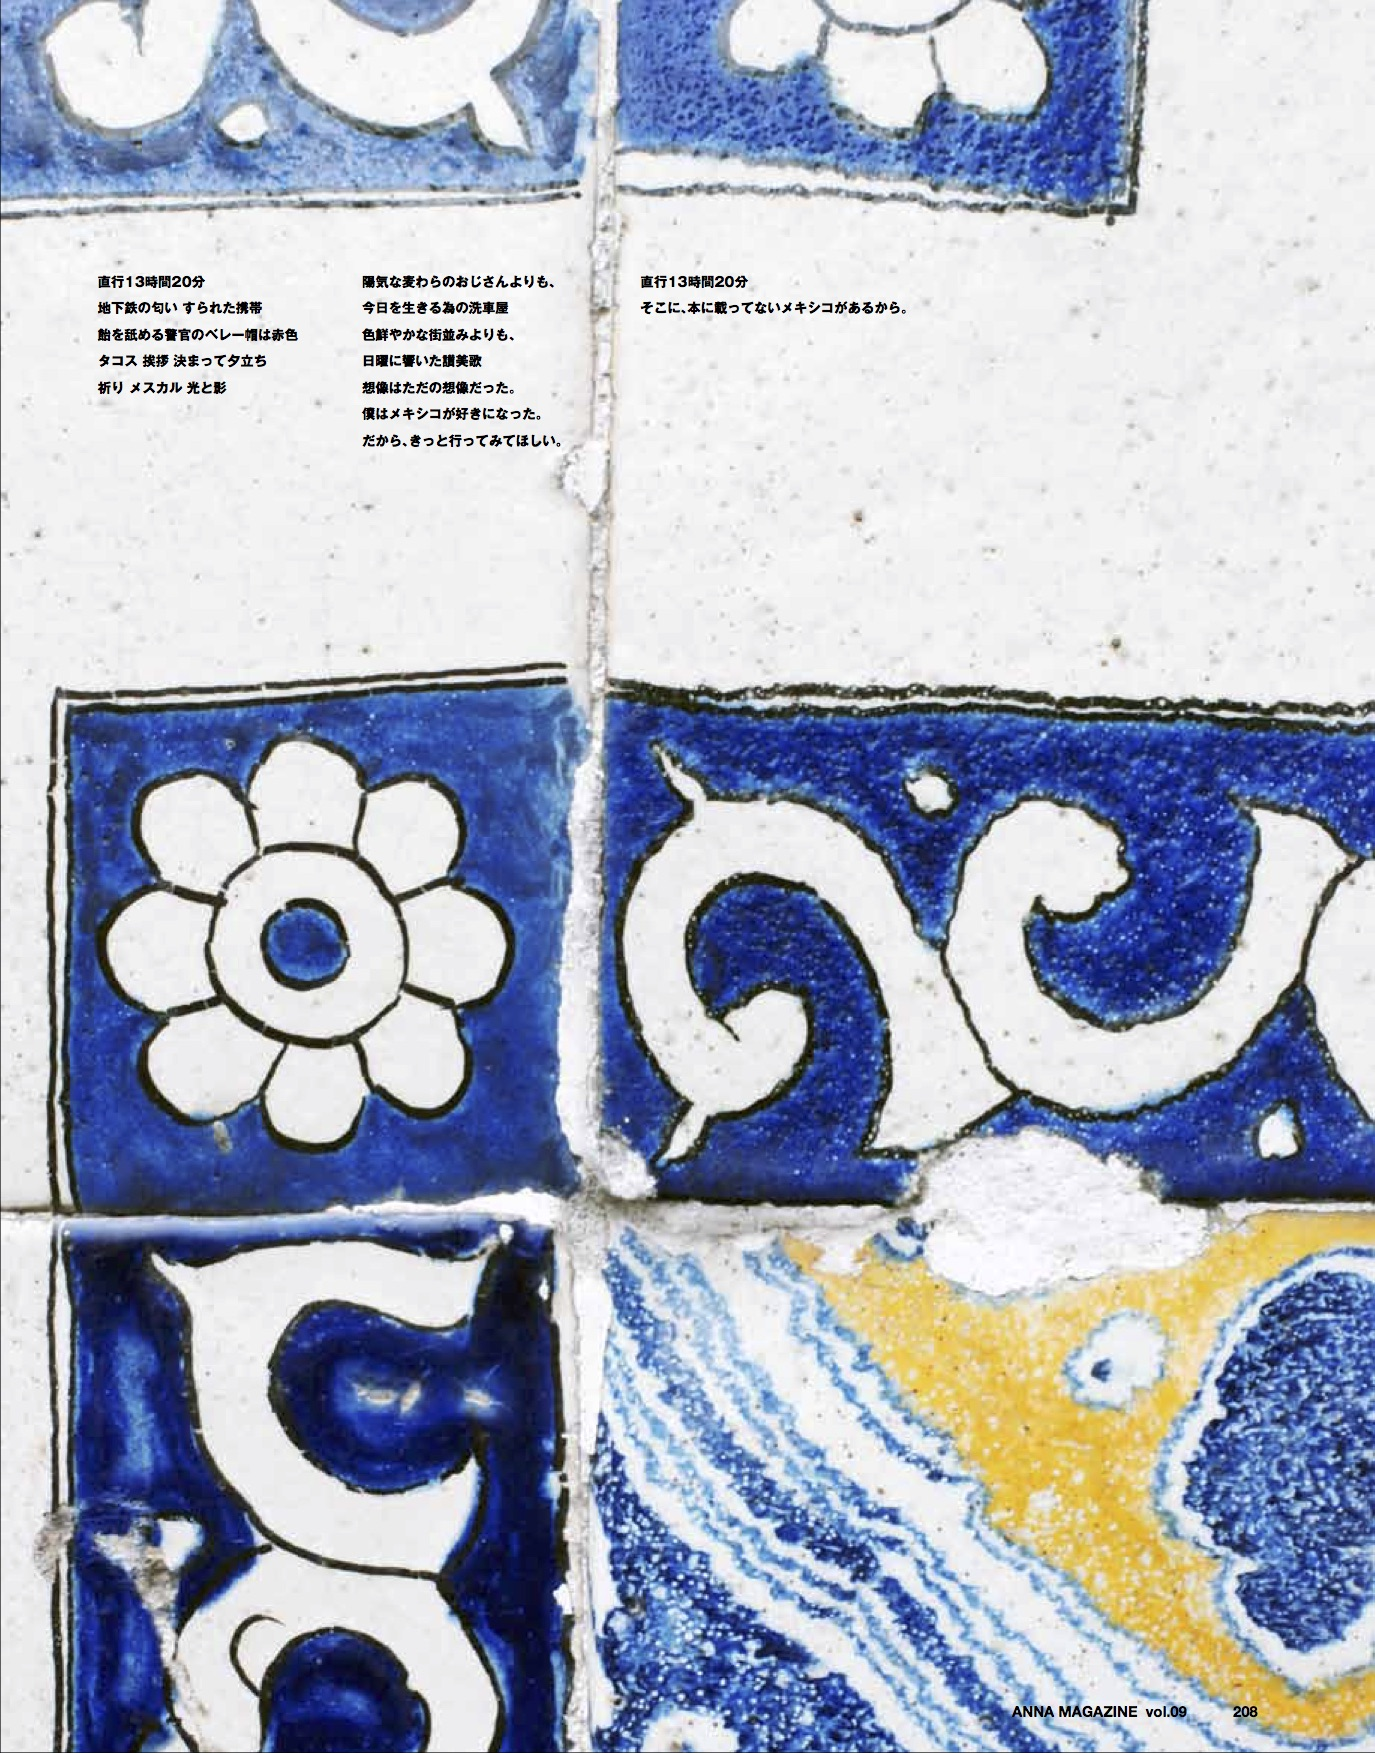 anna magazine vol.9 P104